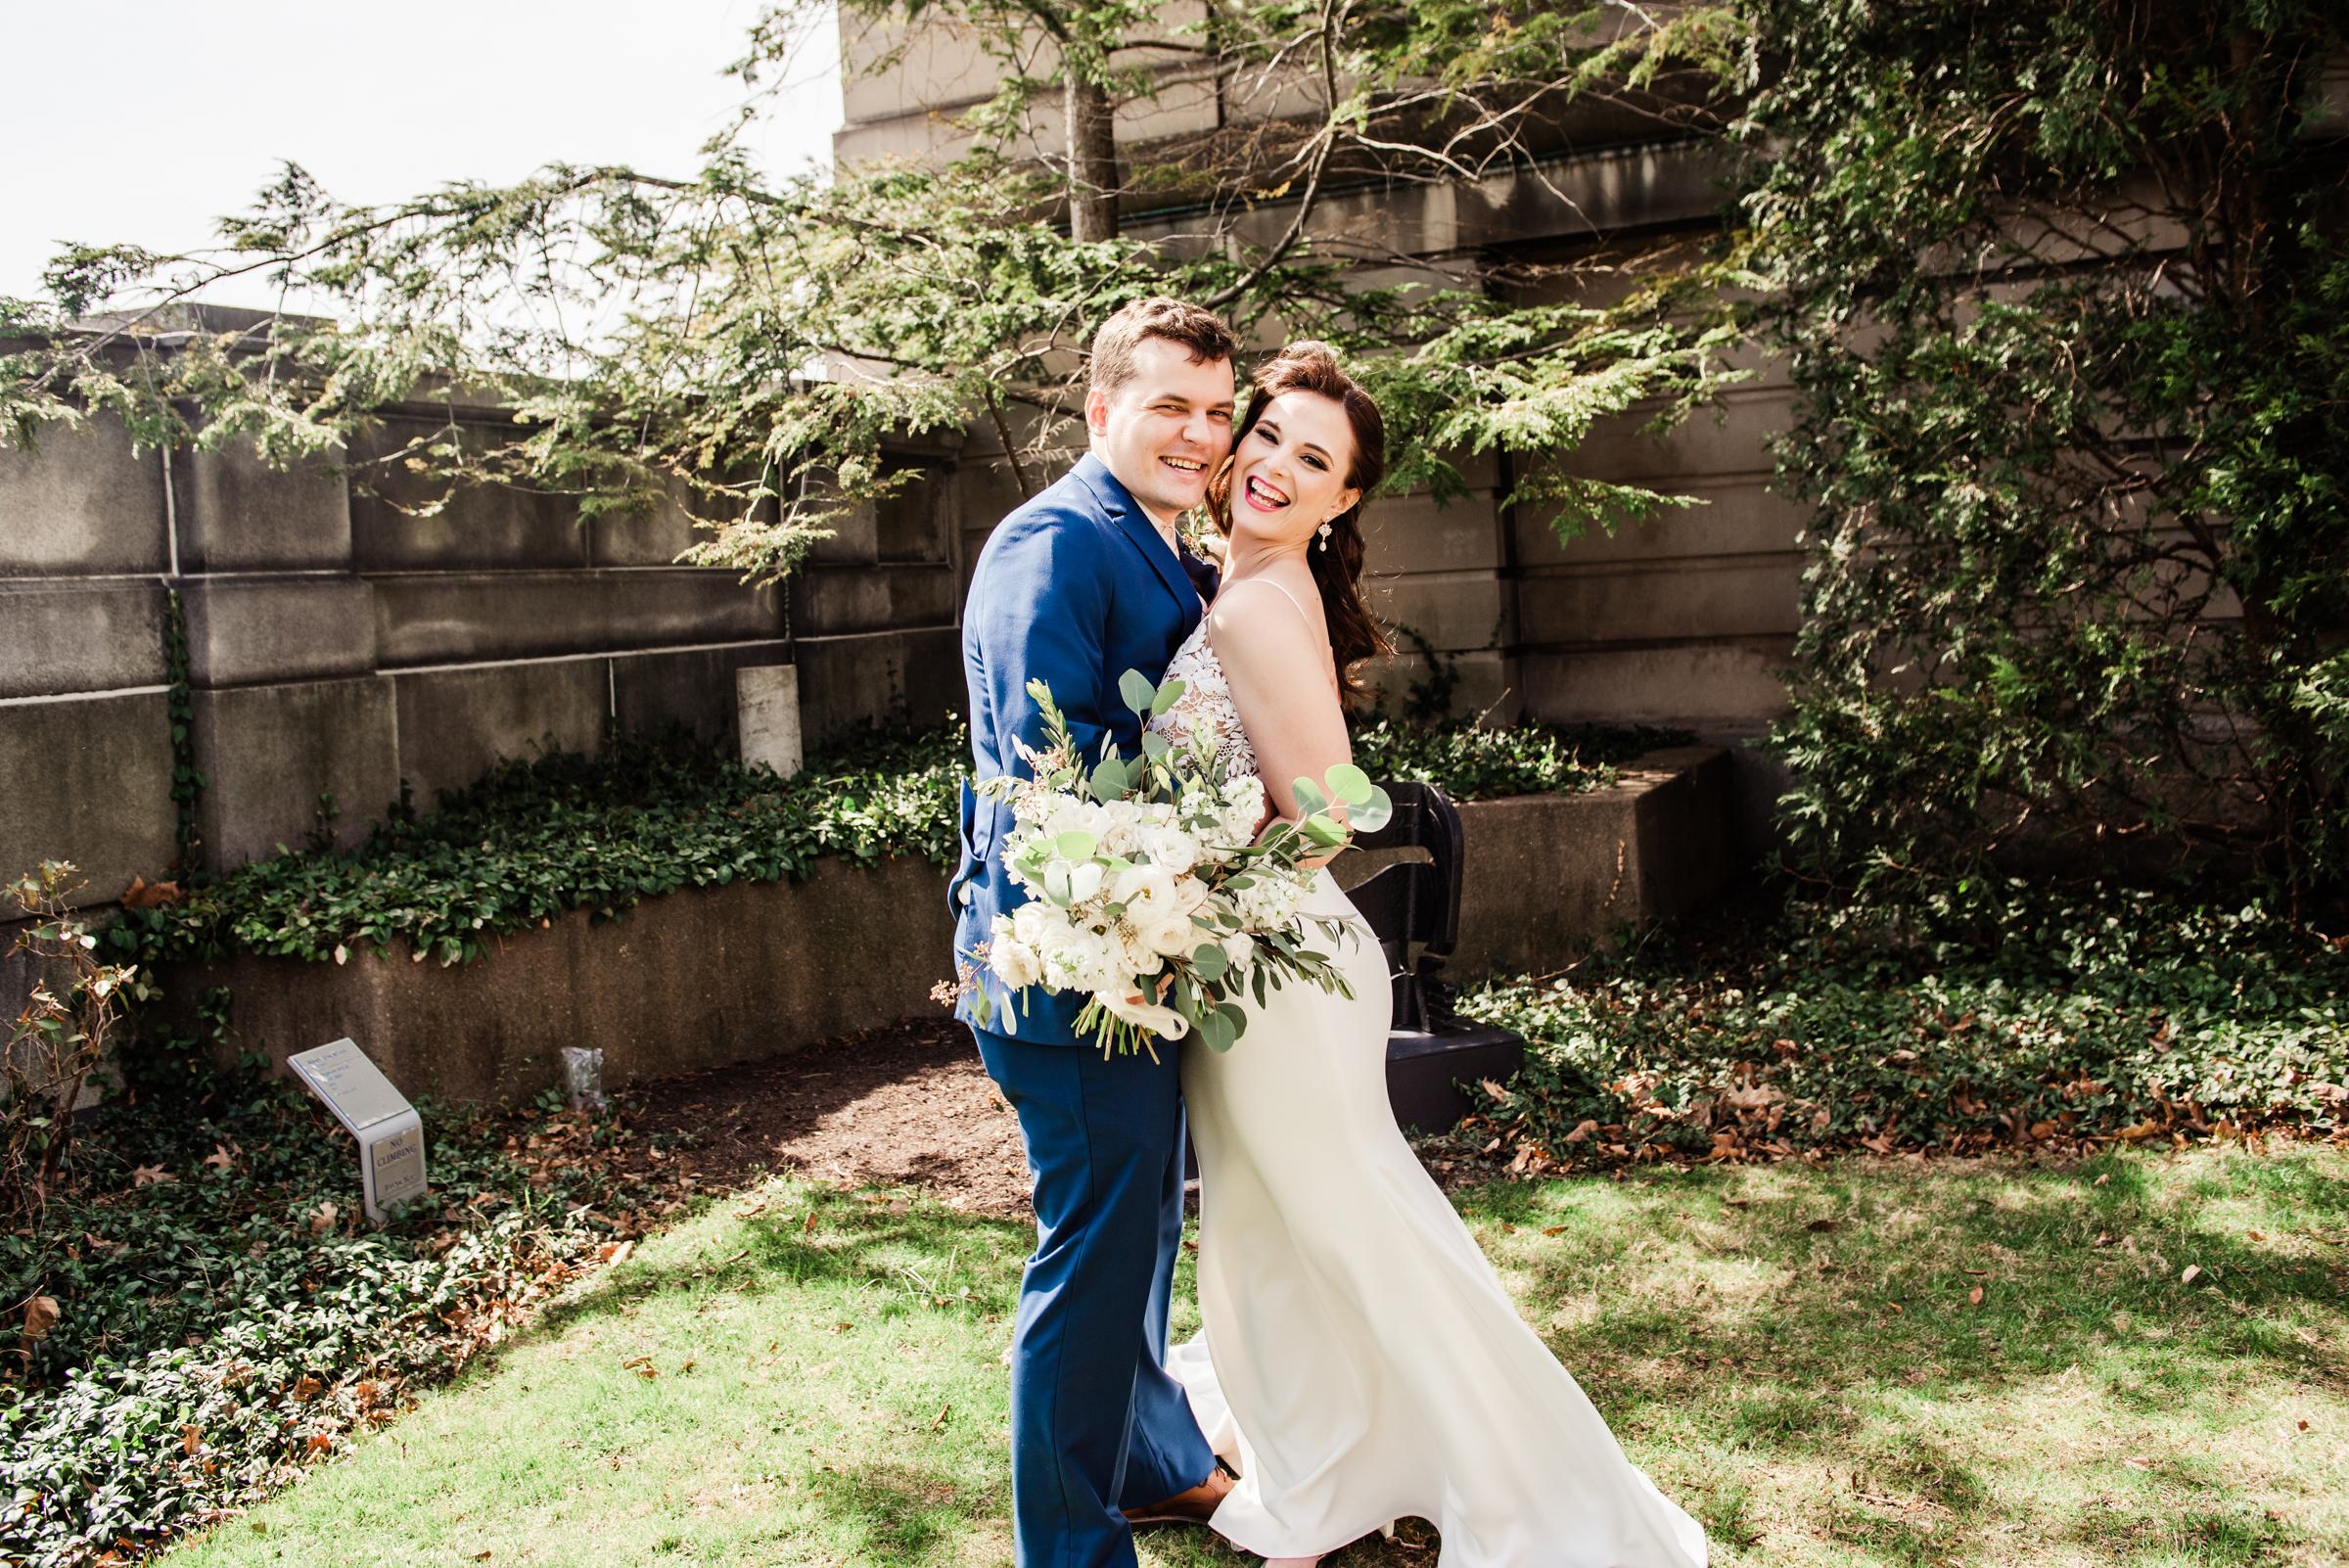 The_Arbor_LoftRochester_Wedding_JILL_STUDIO_Rochester_NY_Photographer_144758.jpg